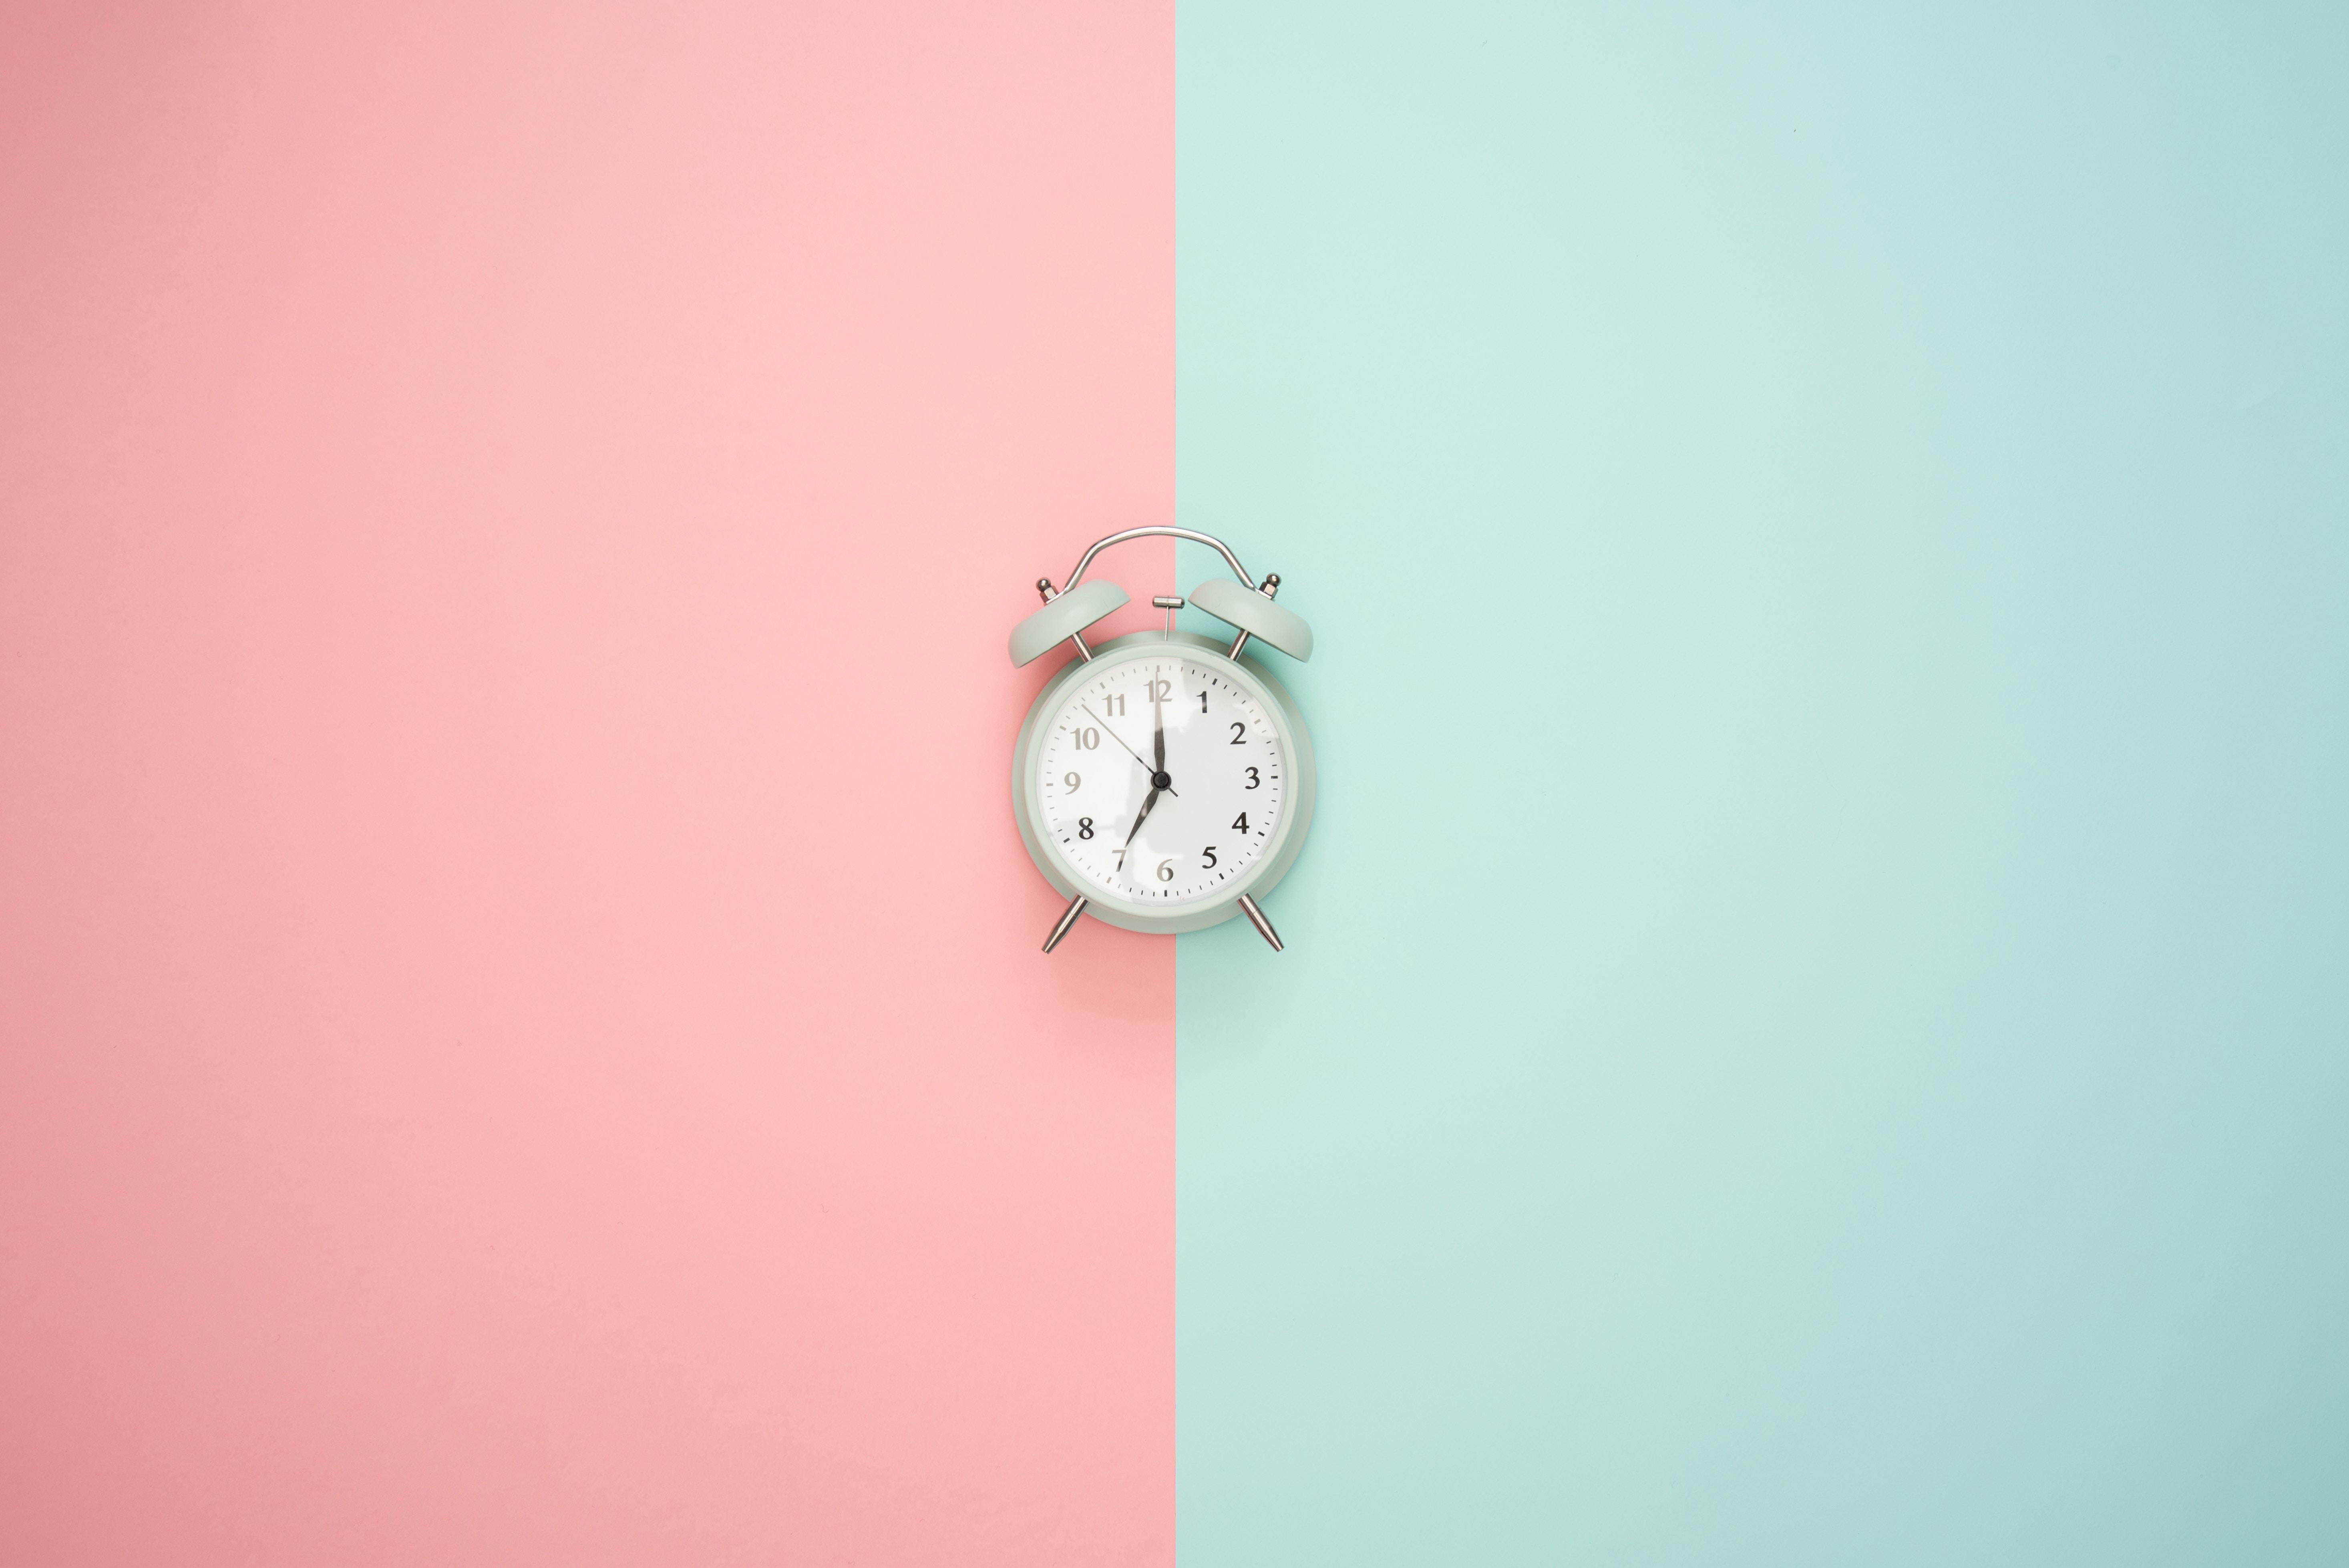 Alarm clock between light blue and light pink panels